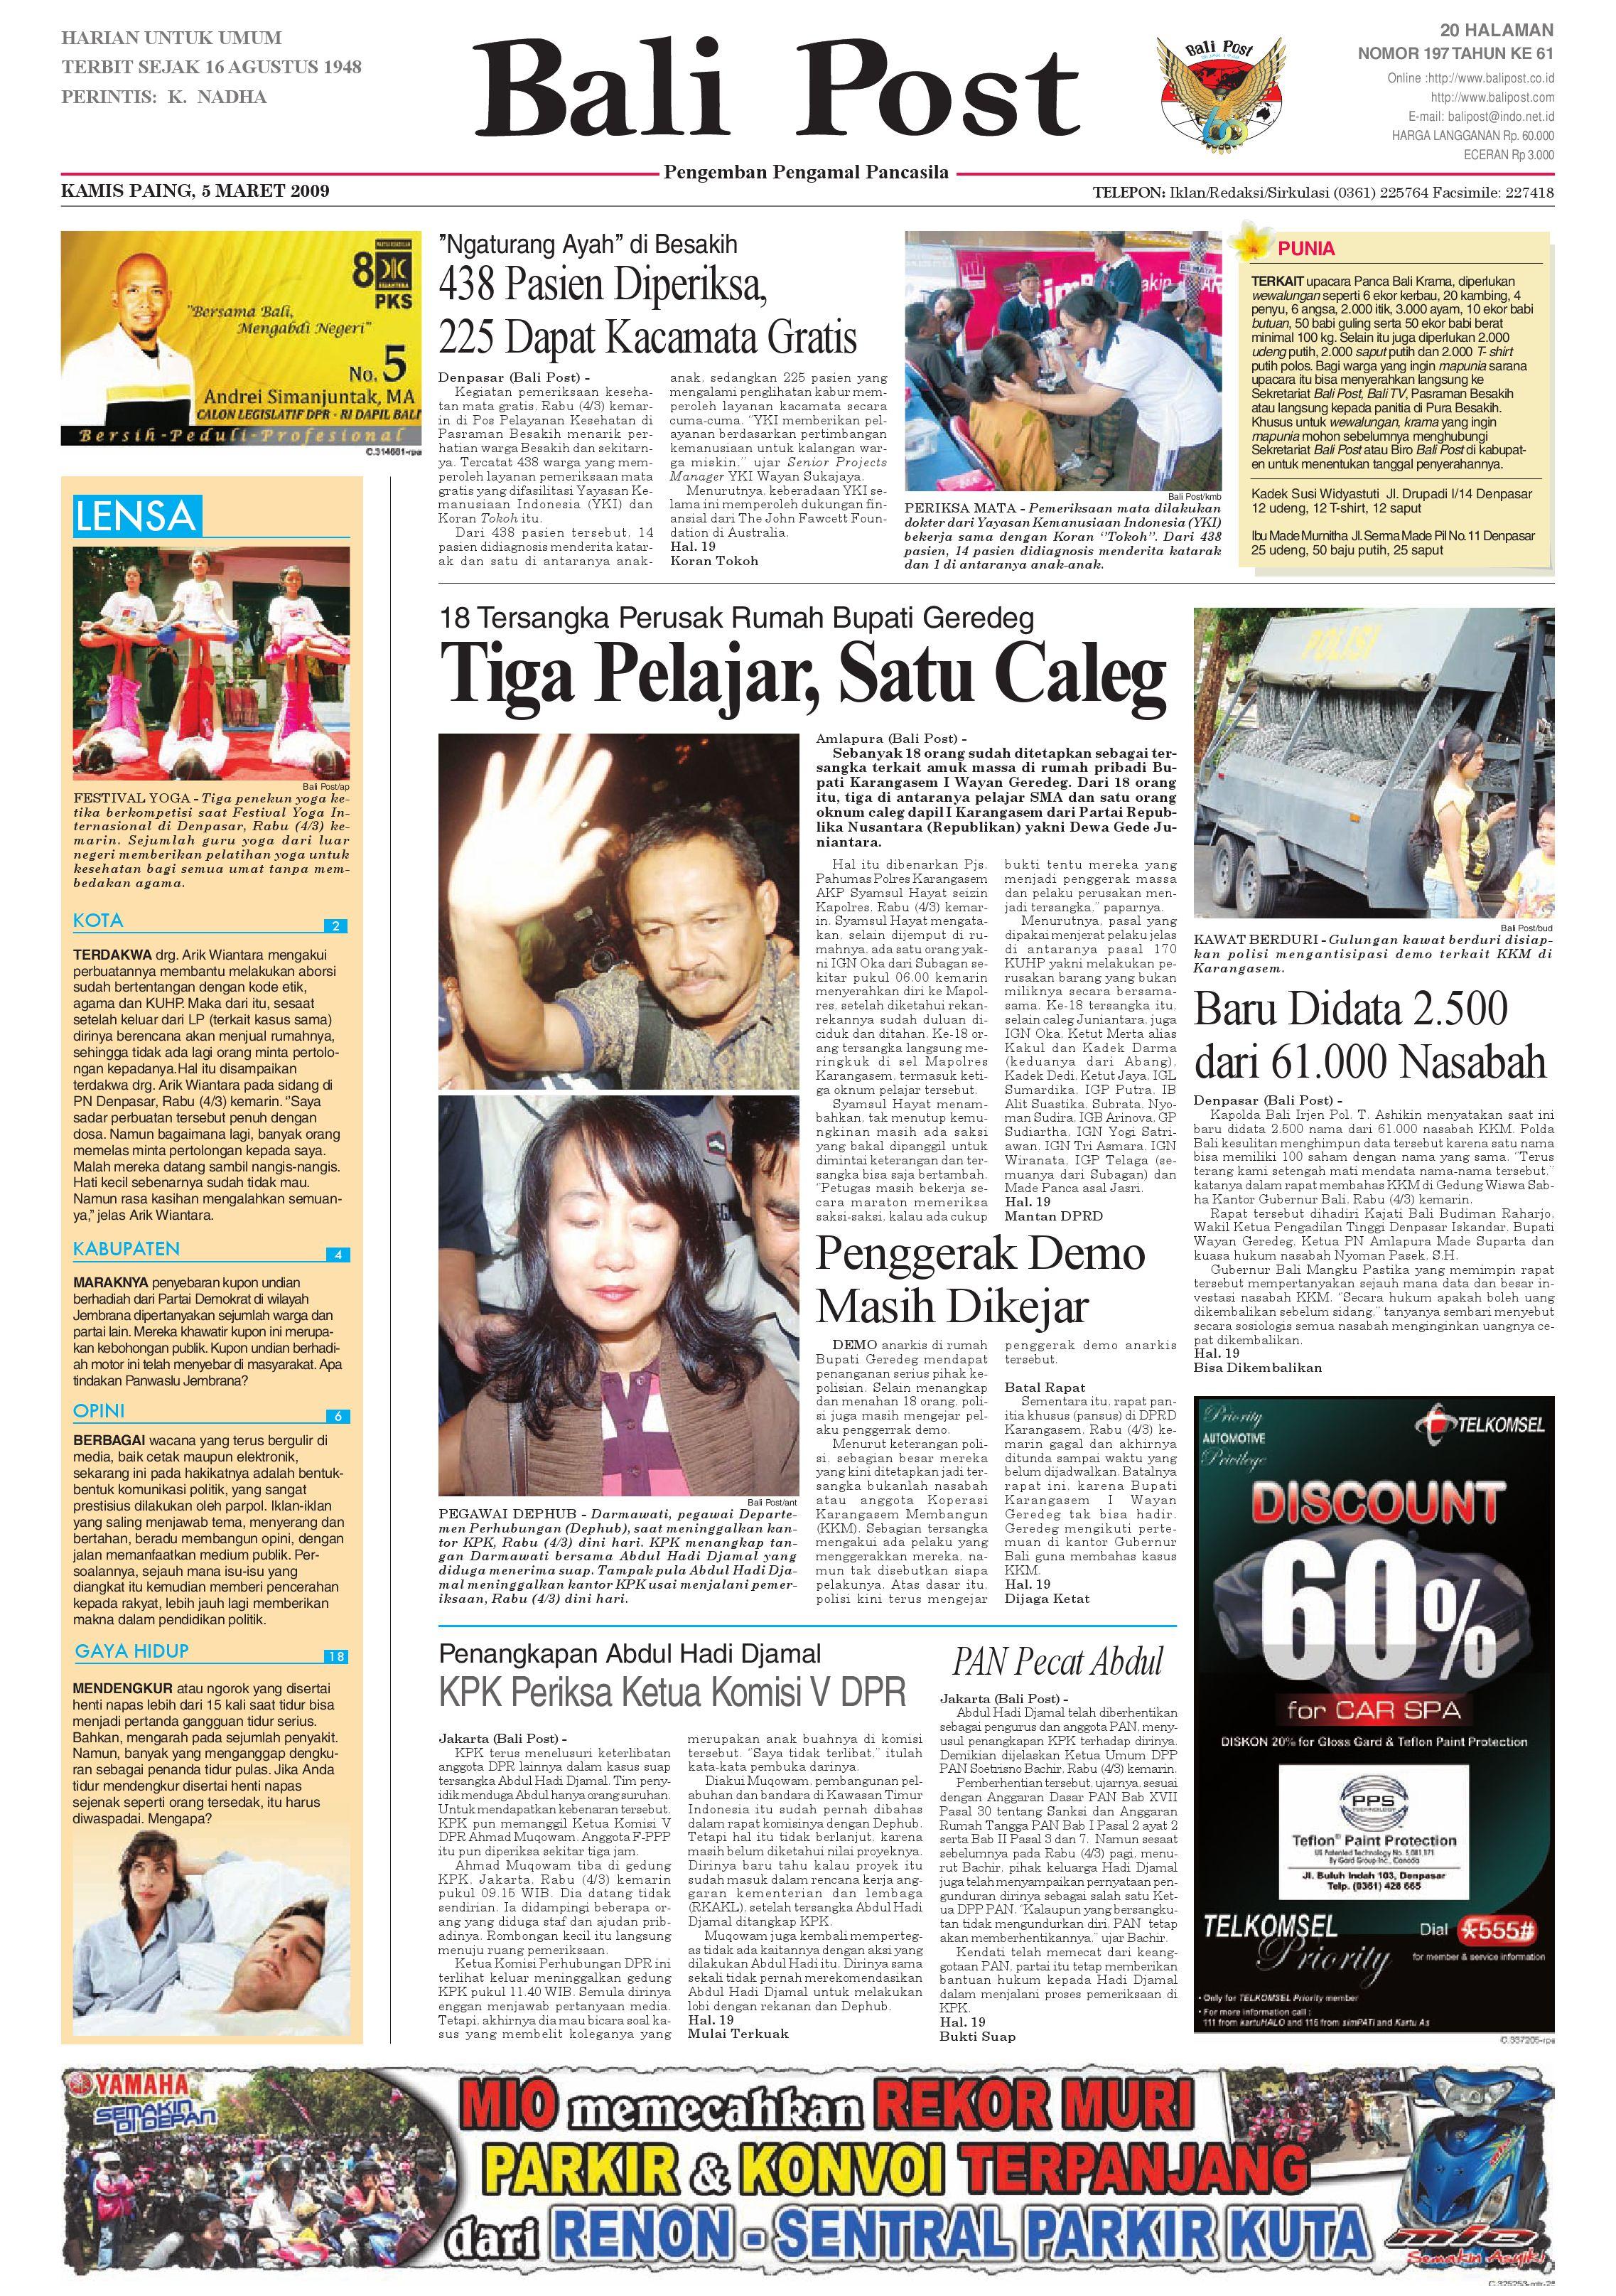 Bali Post Kamis 5 Maret 2009 By E Paper Kmb Issuu Produk Ukm Bumn Rasa Dewa Sari Buah Mbing 250ml Jus Free Ongkir Depok Ampamp Jakarta